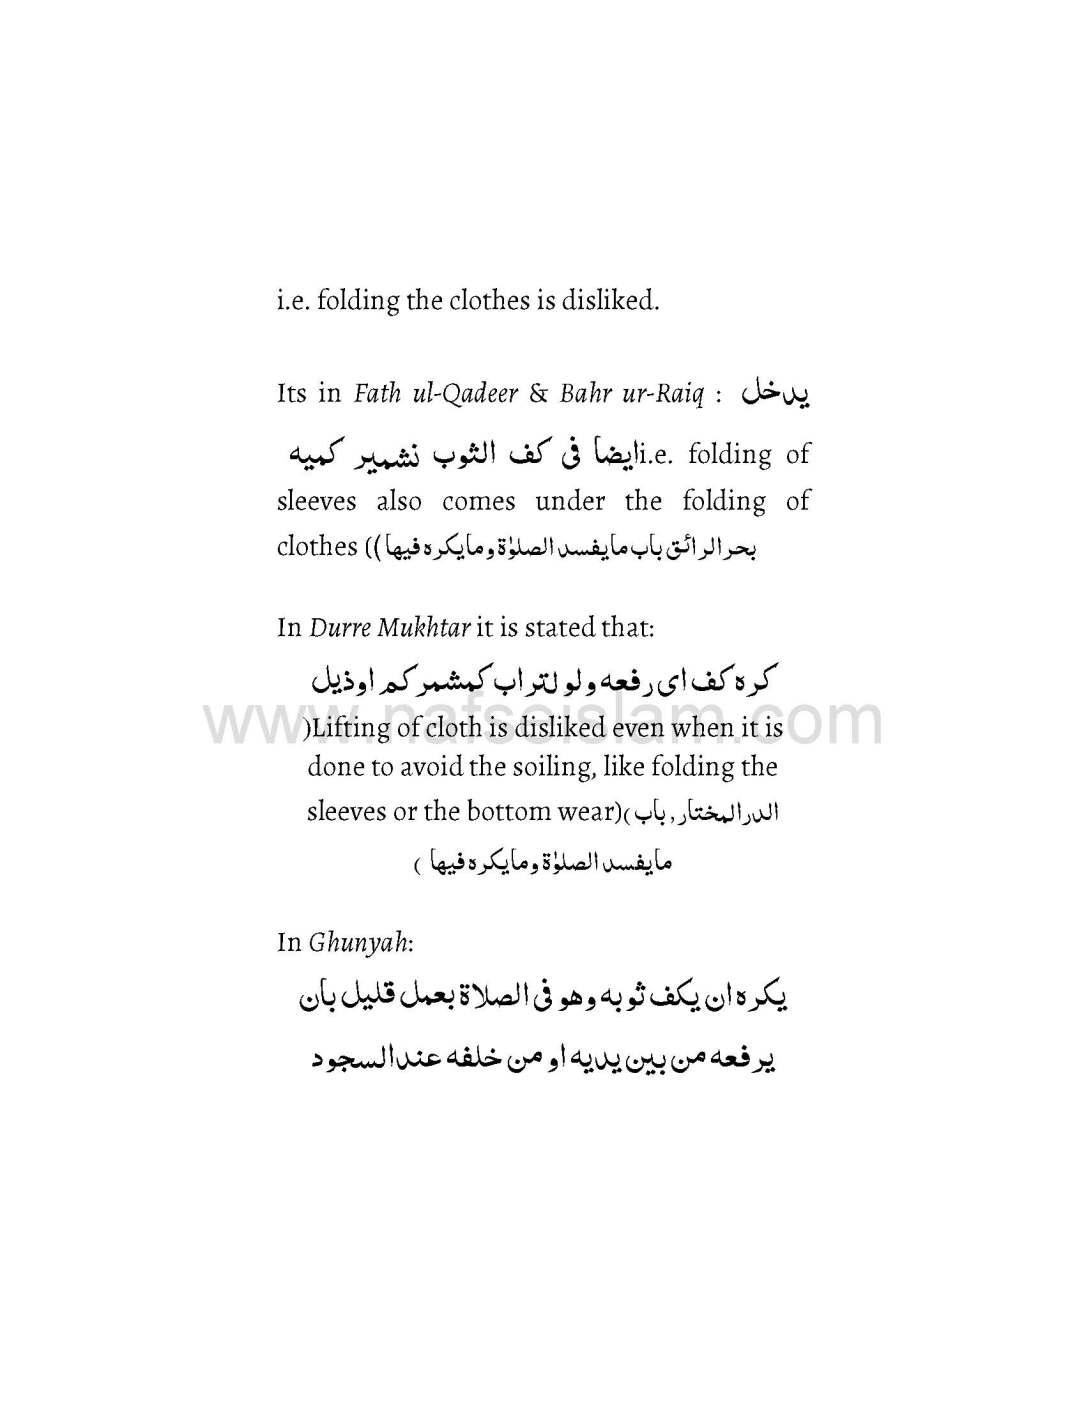 Islamic Ruling On Folding Pants In Salah_Page_22